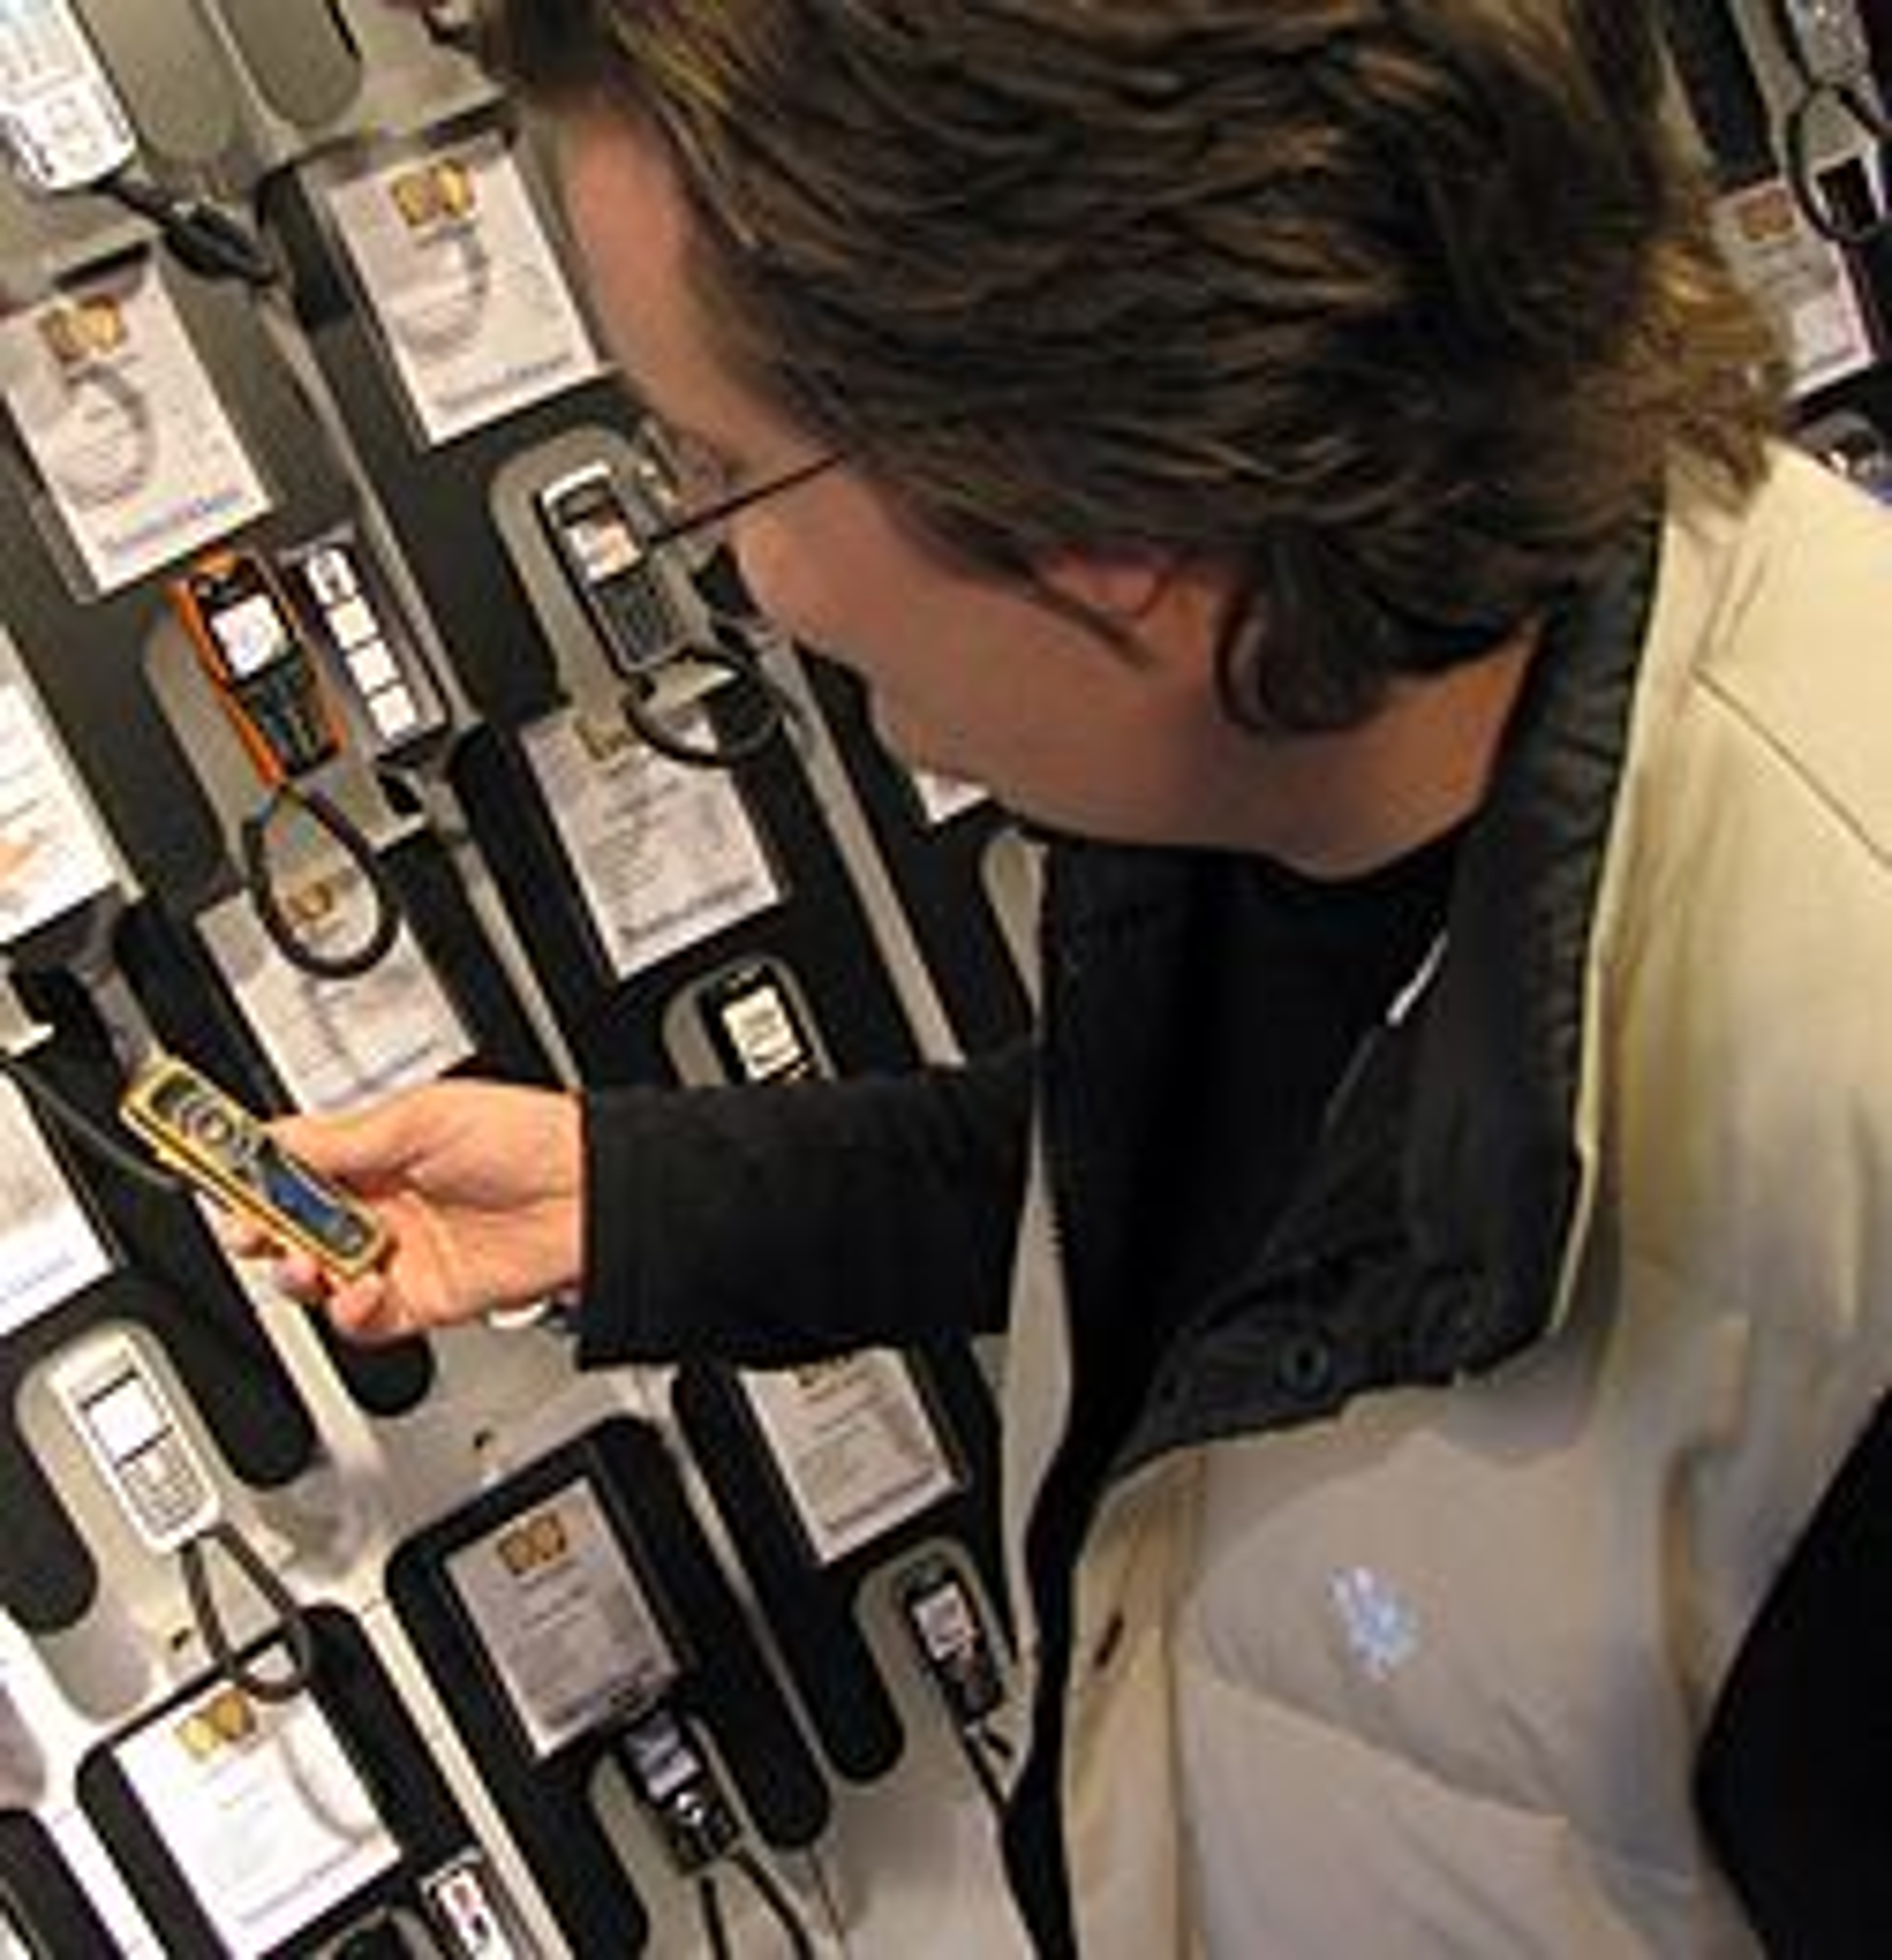 I mobilbutikken får du personlig service. (Foto: Marius Valle)